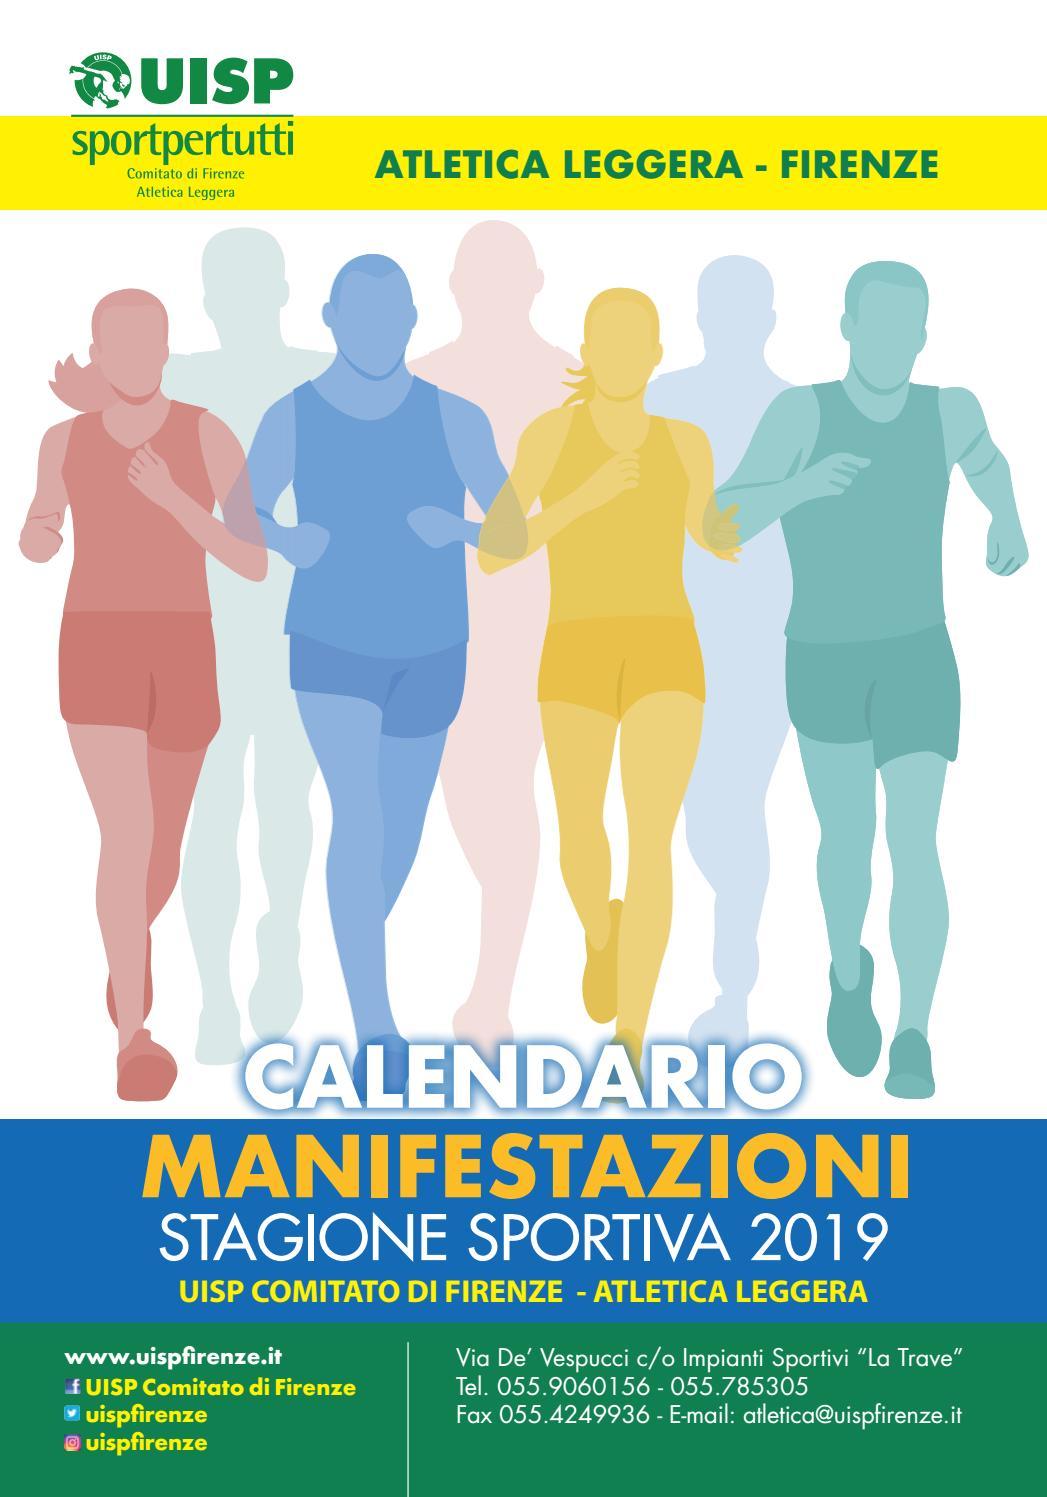 Calendario Gare Podistiche Toscana.Calendario Manifestazioni Uisp Atletica Leggera Firenze 2019